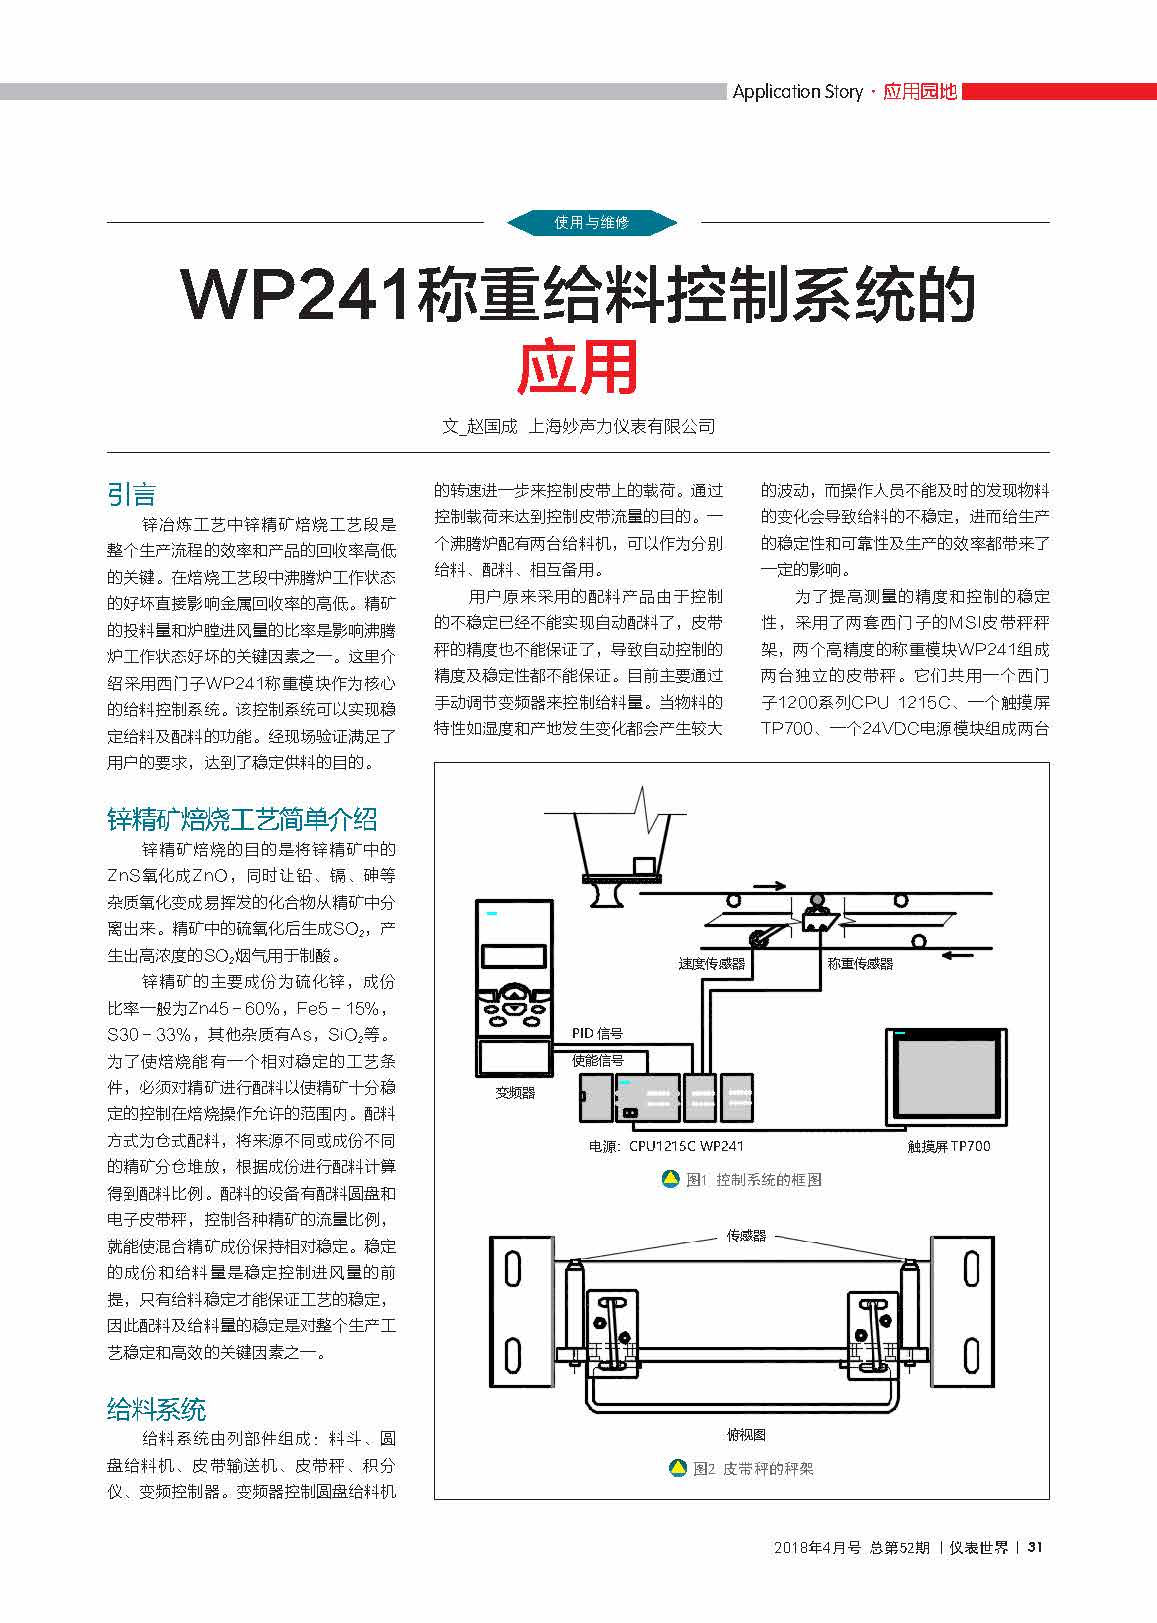 WP241称重给料控制系统的应用(作者 赵国成)